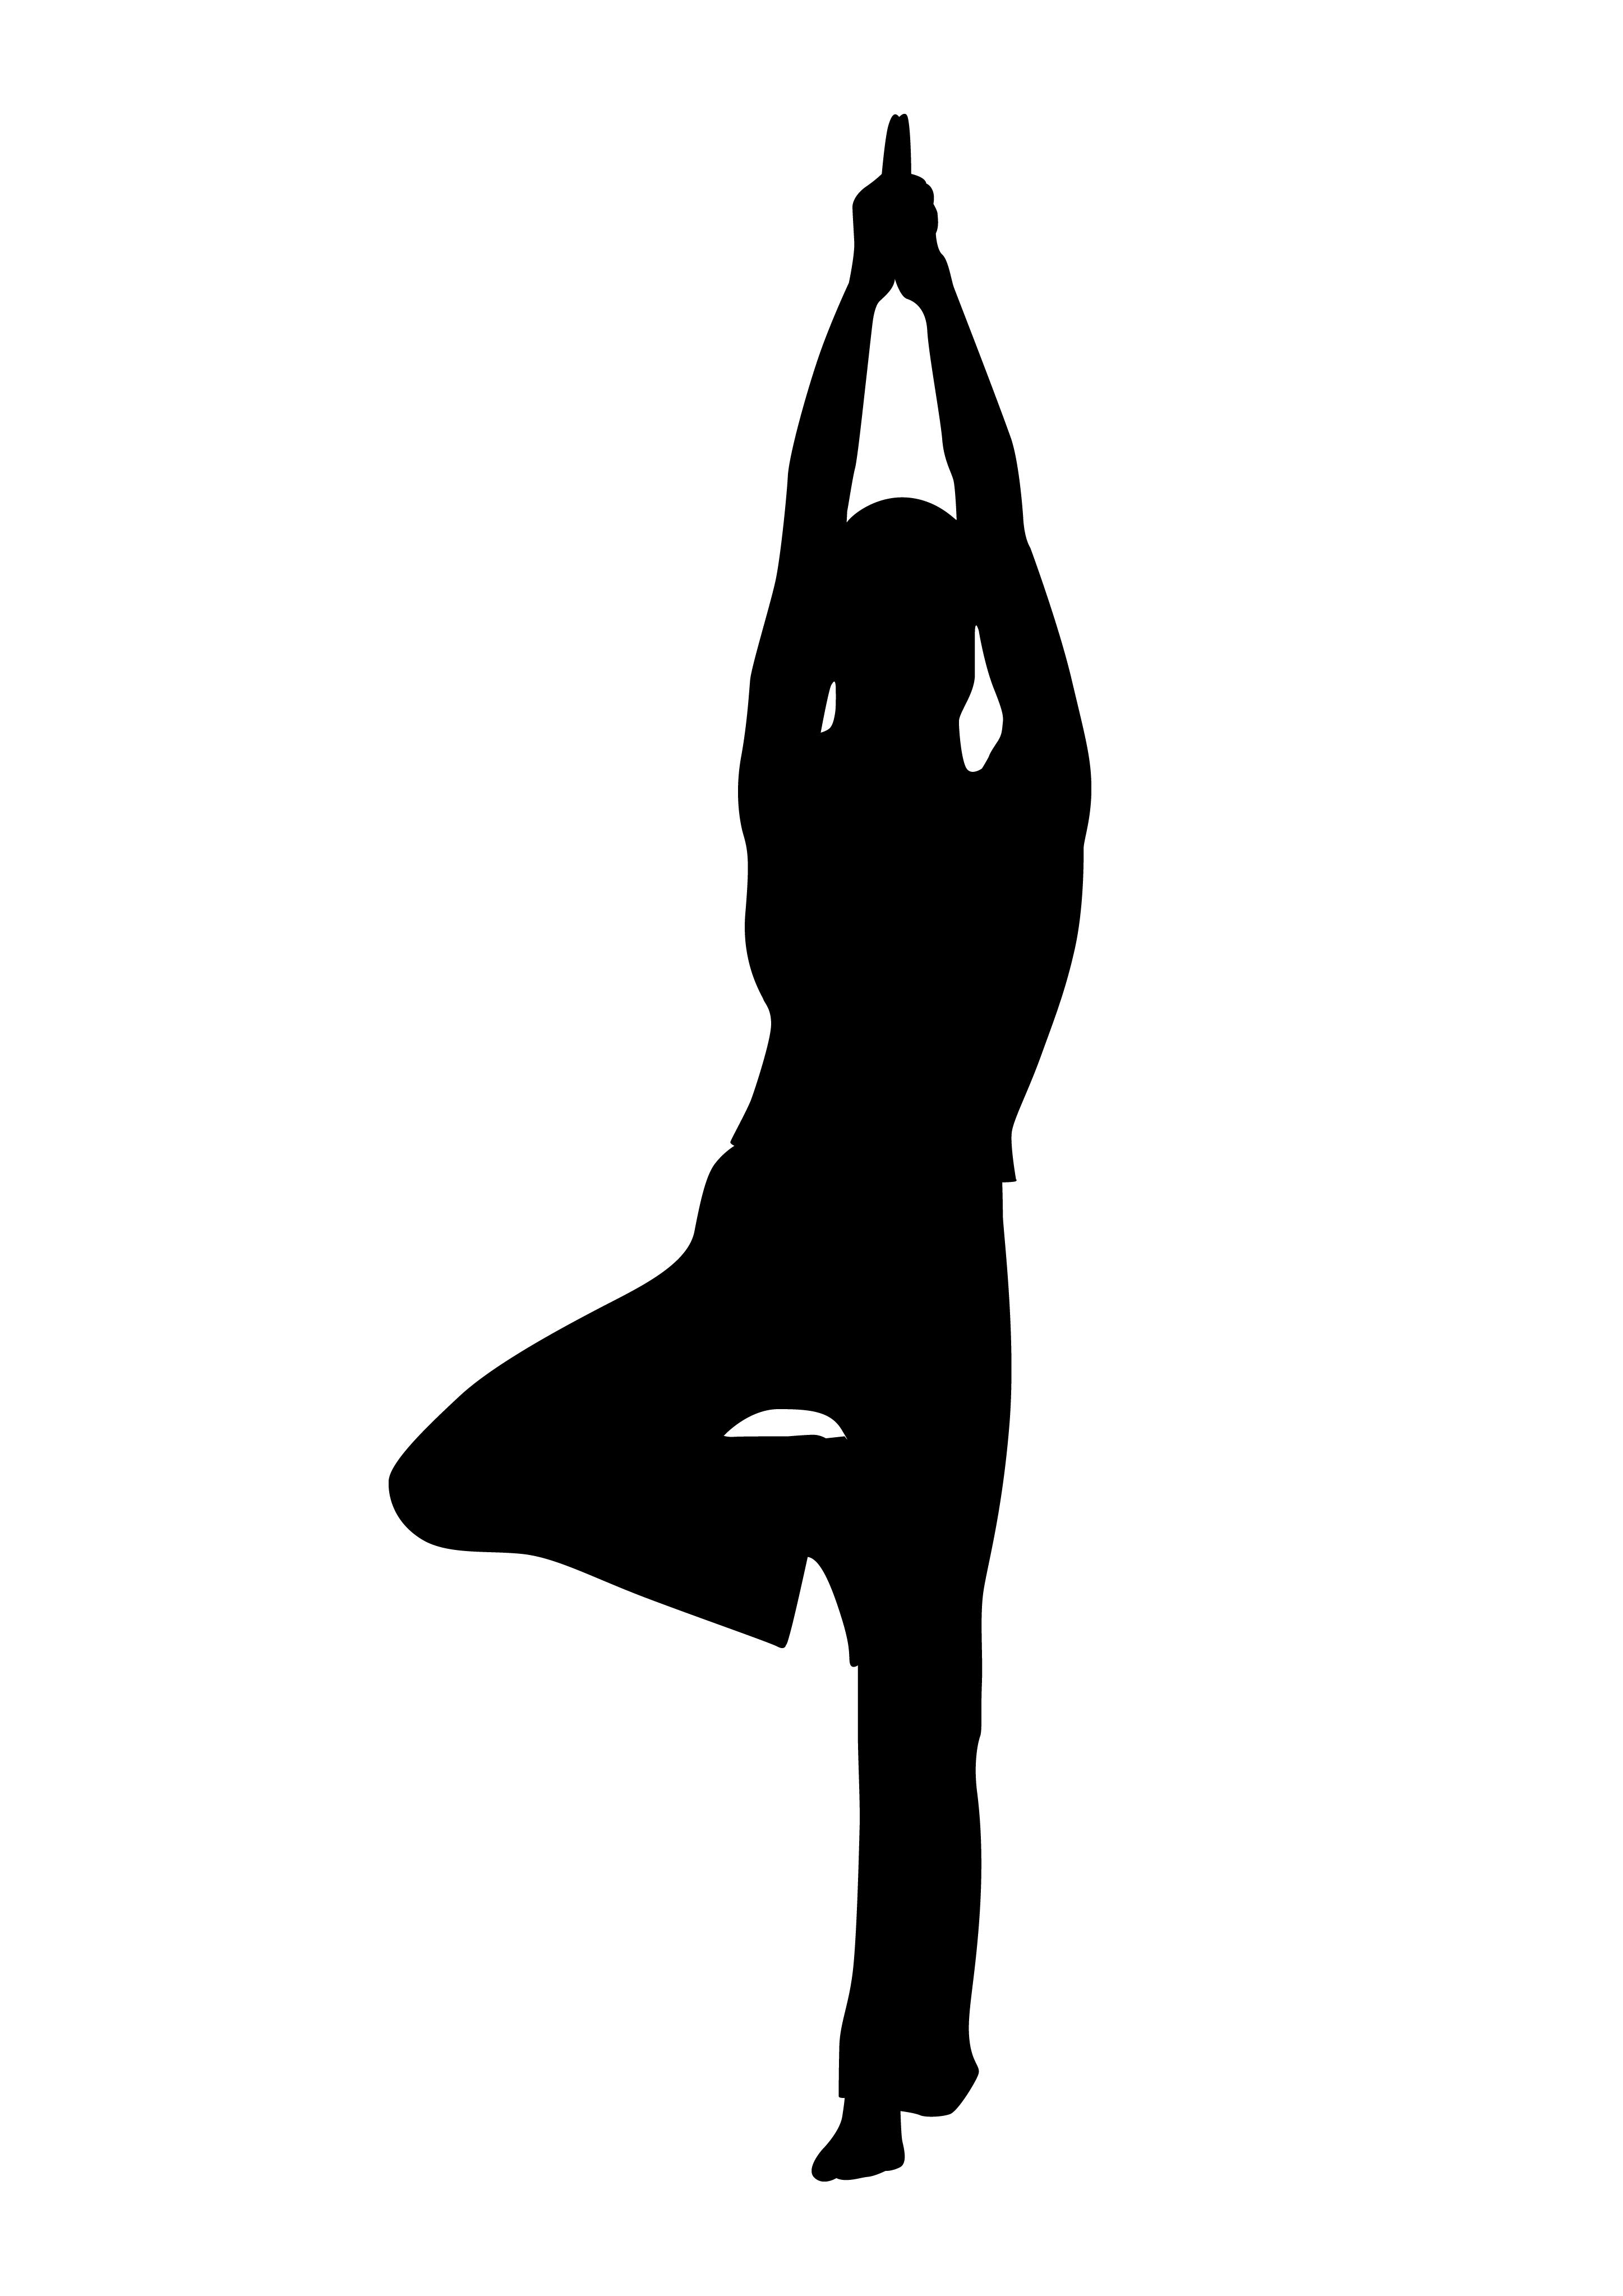 Senior Yoga Poses Clipart #1 - Yoga Poses PNG HD